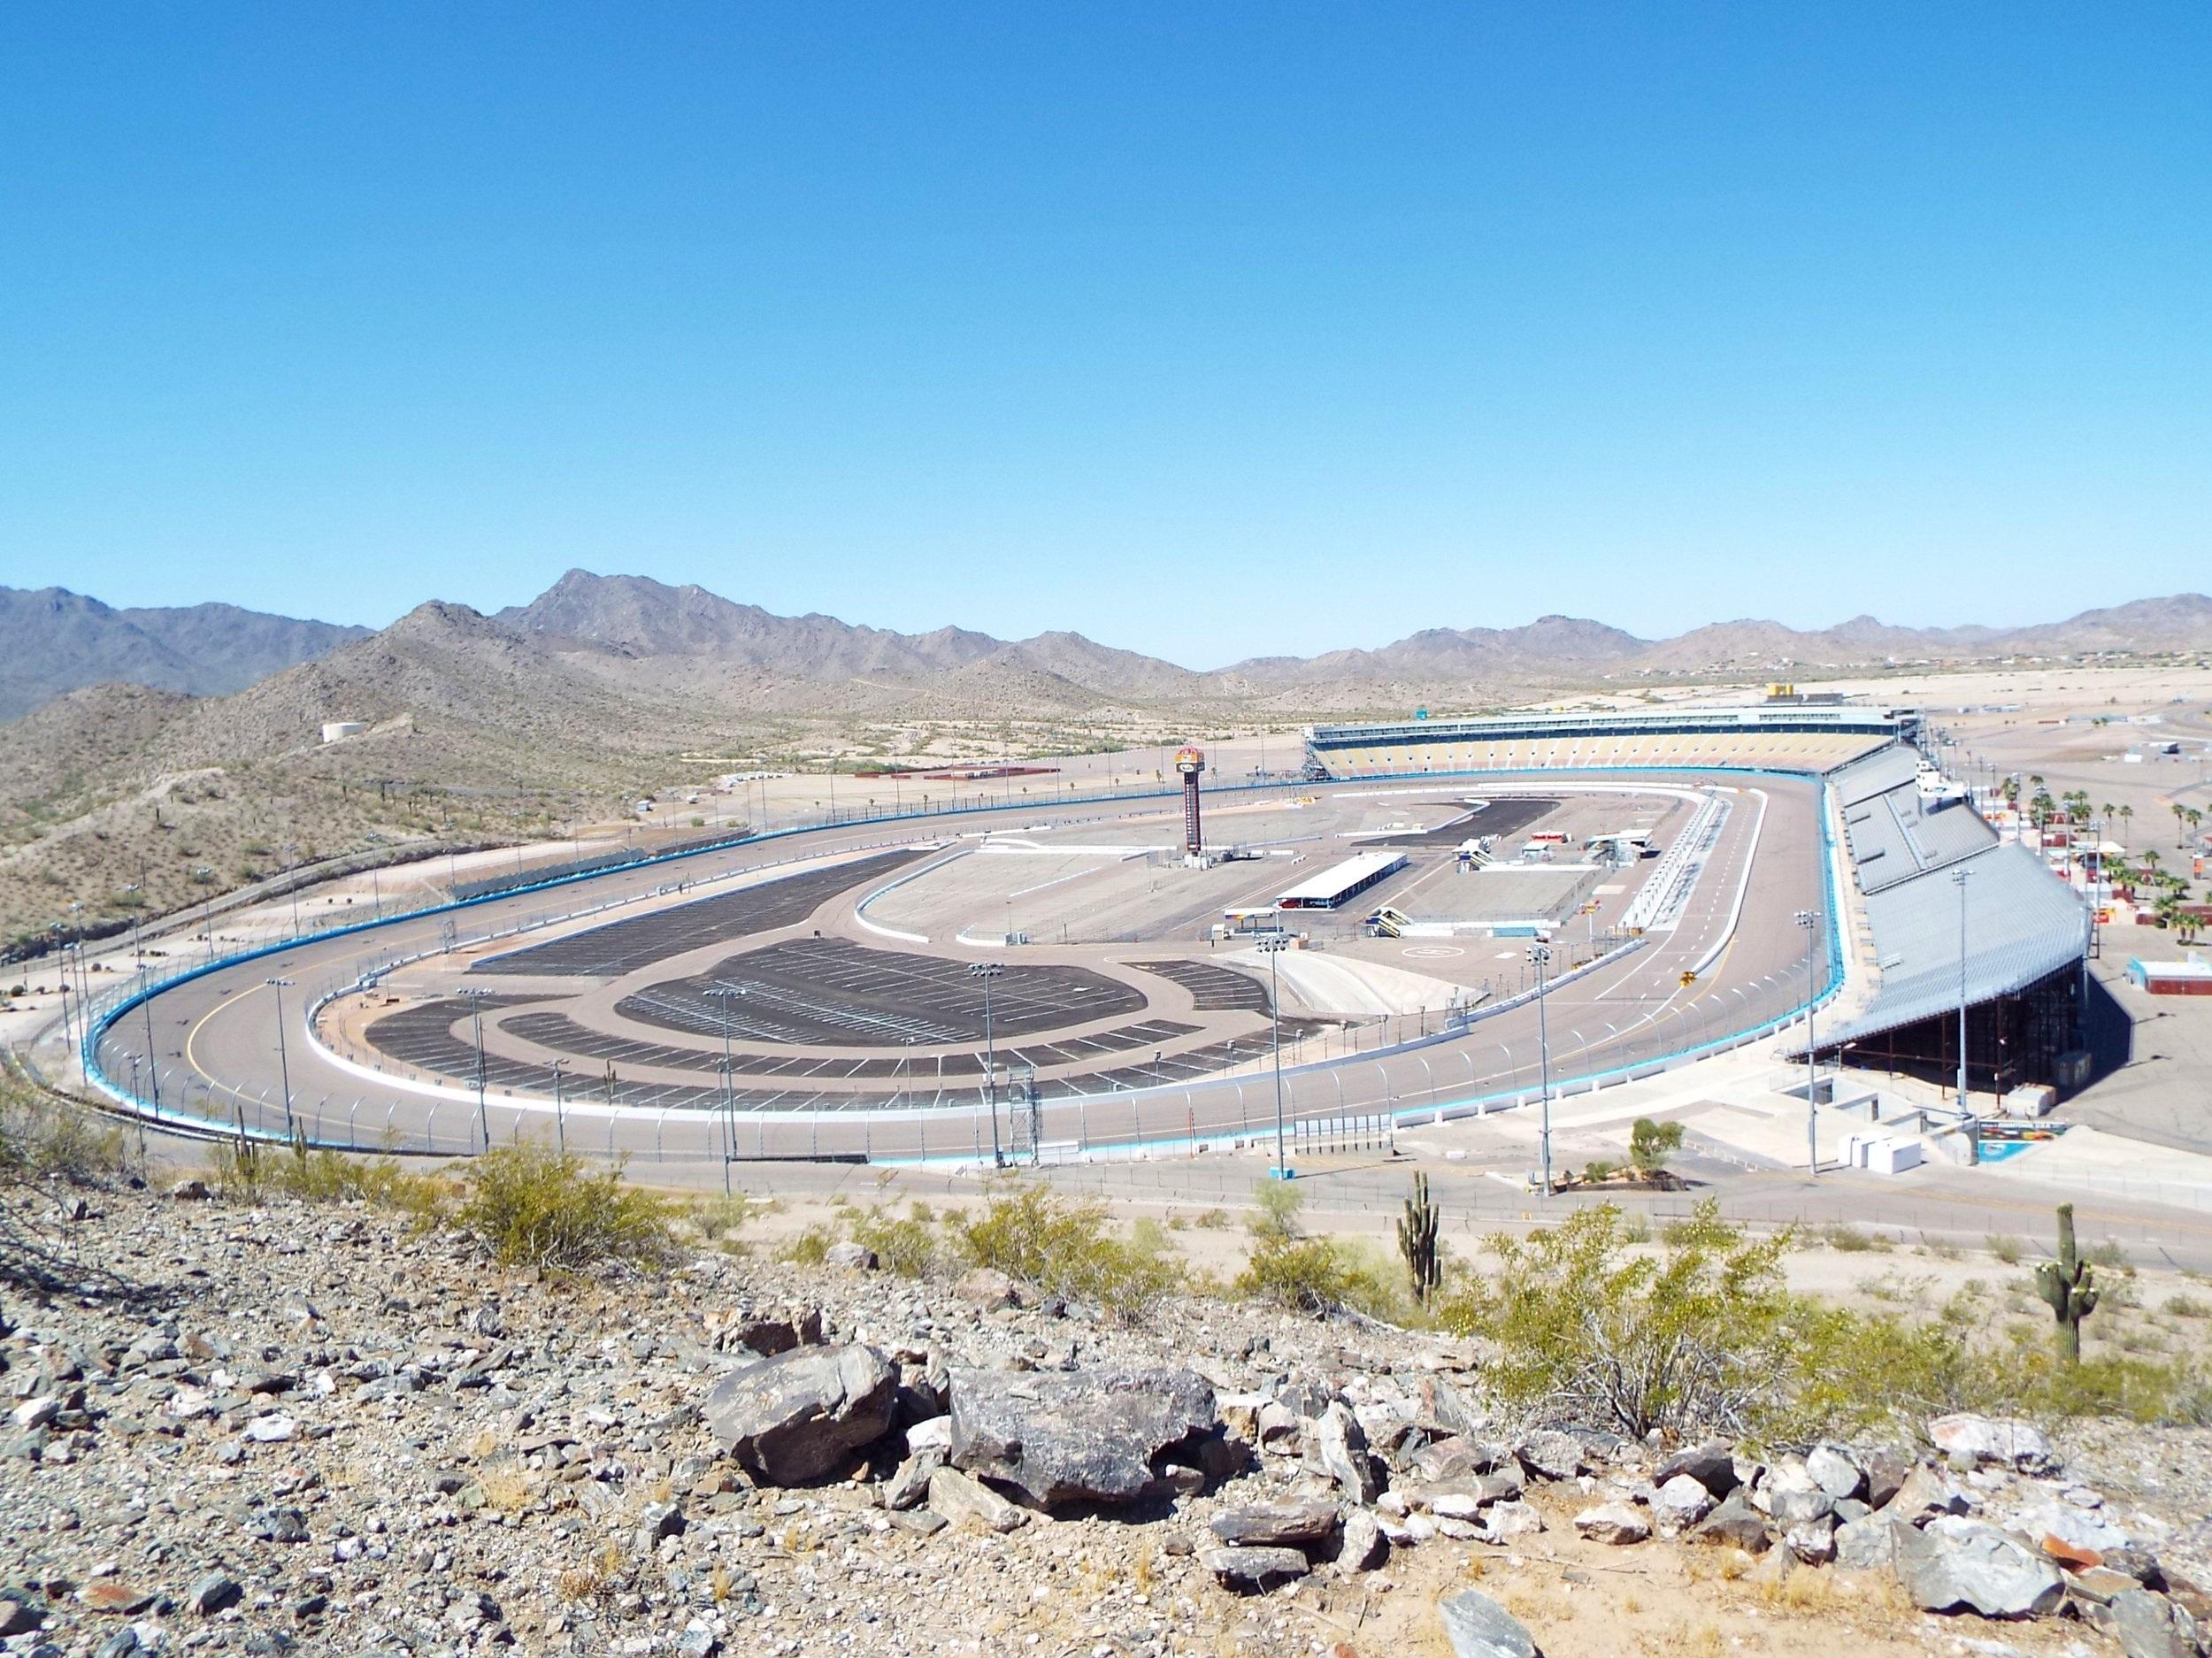 Avondale-Phoenix International Raceway